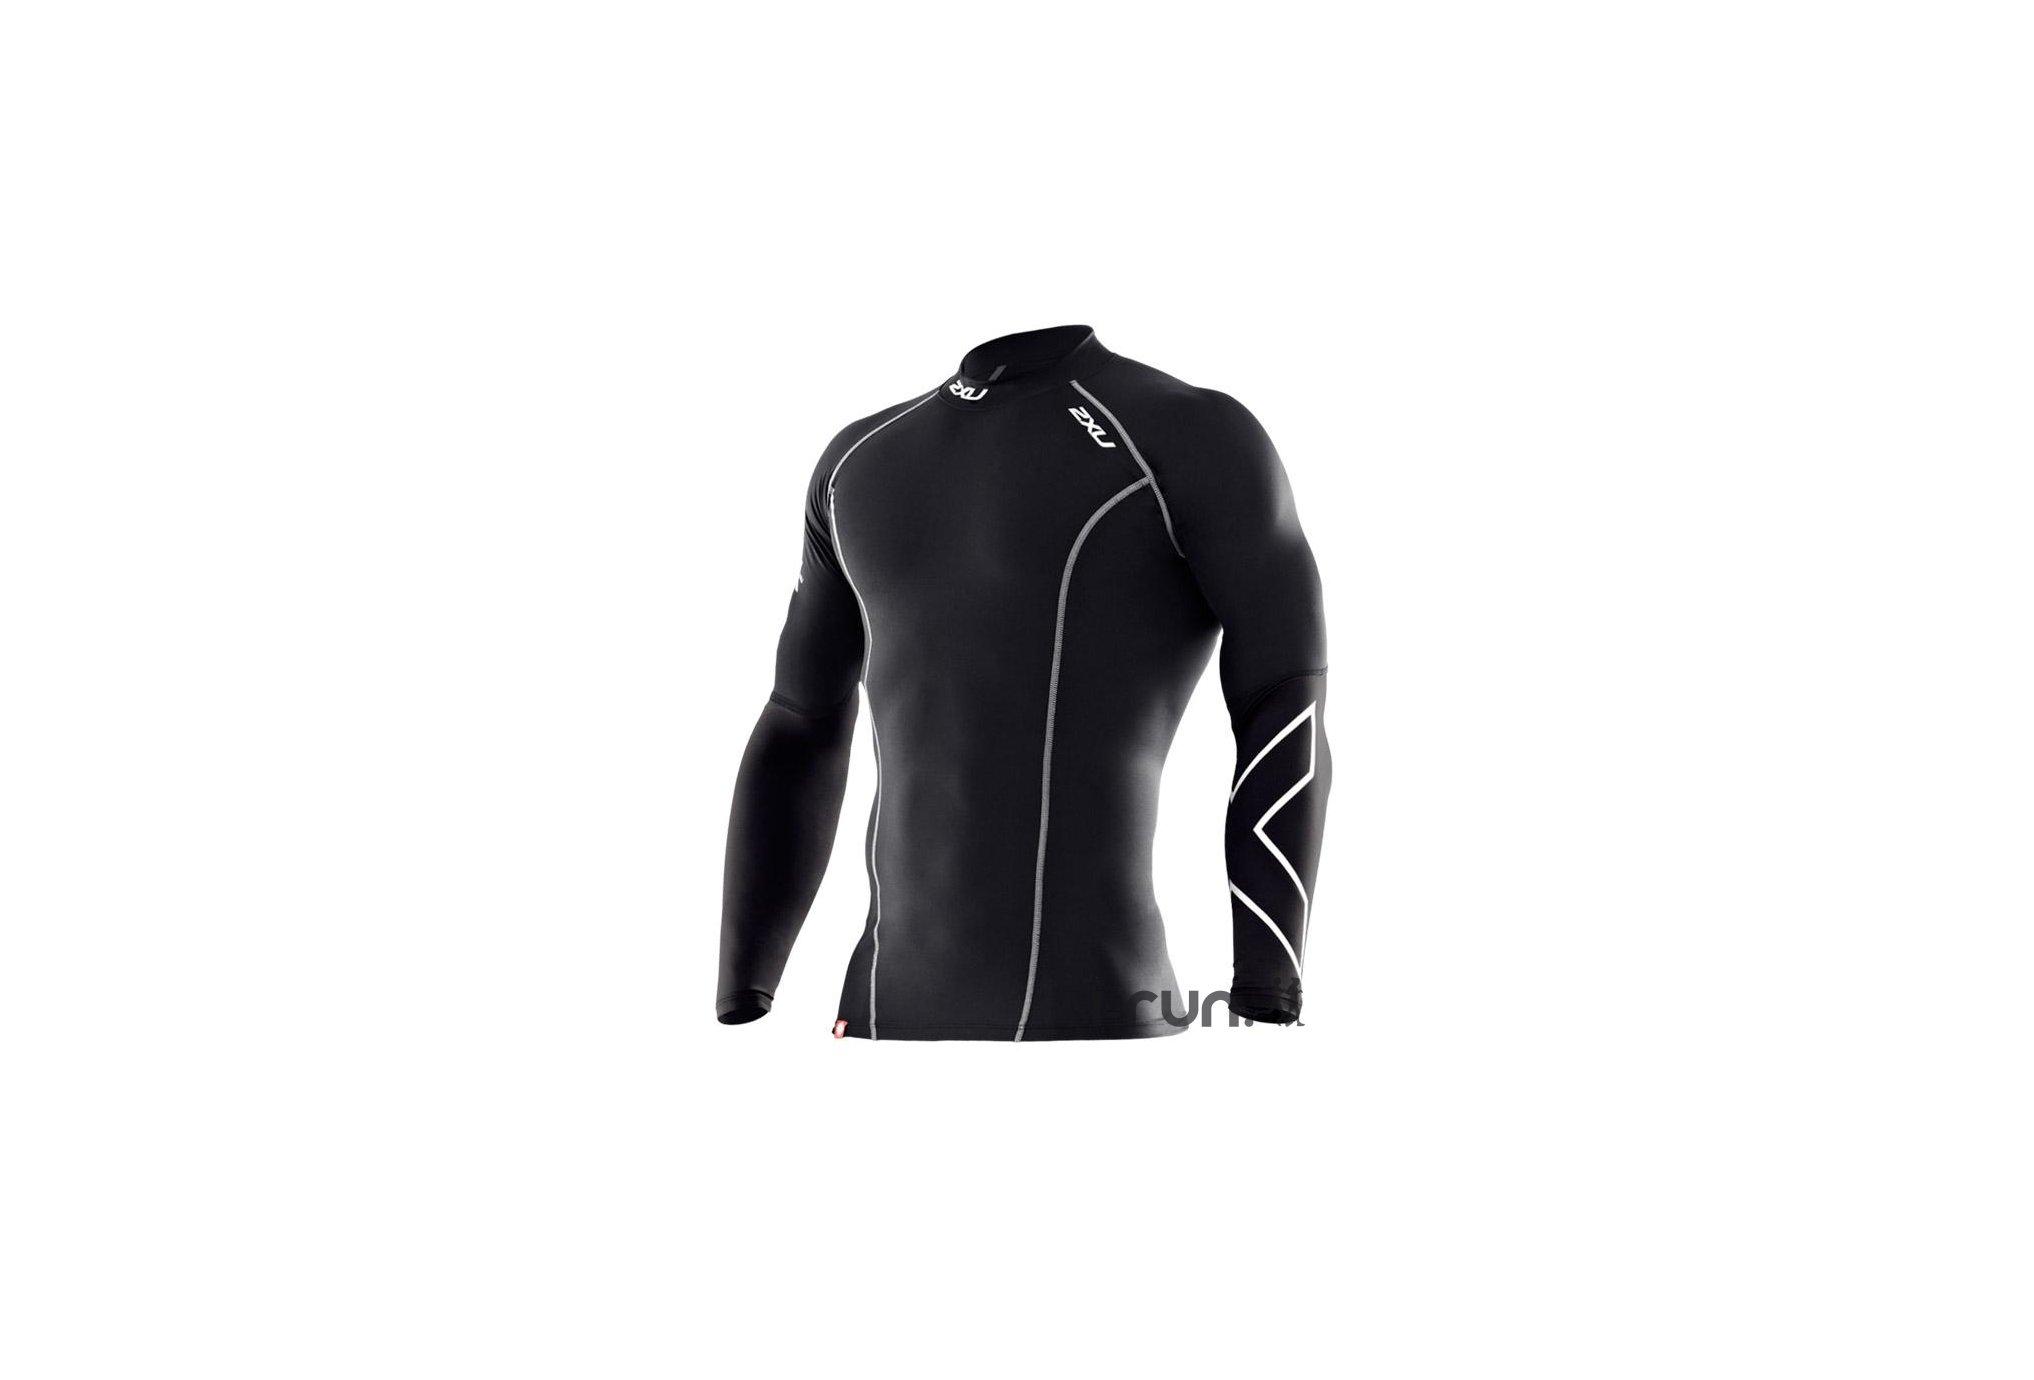 2xu Tee-Shirt l/s thermal compression m vêtement running homme